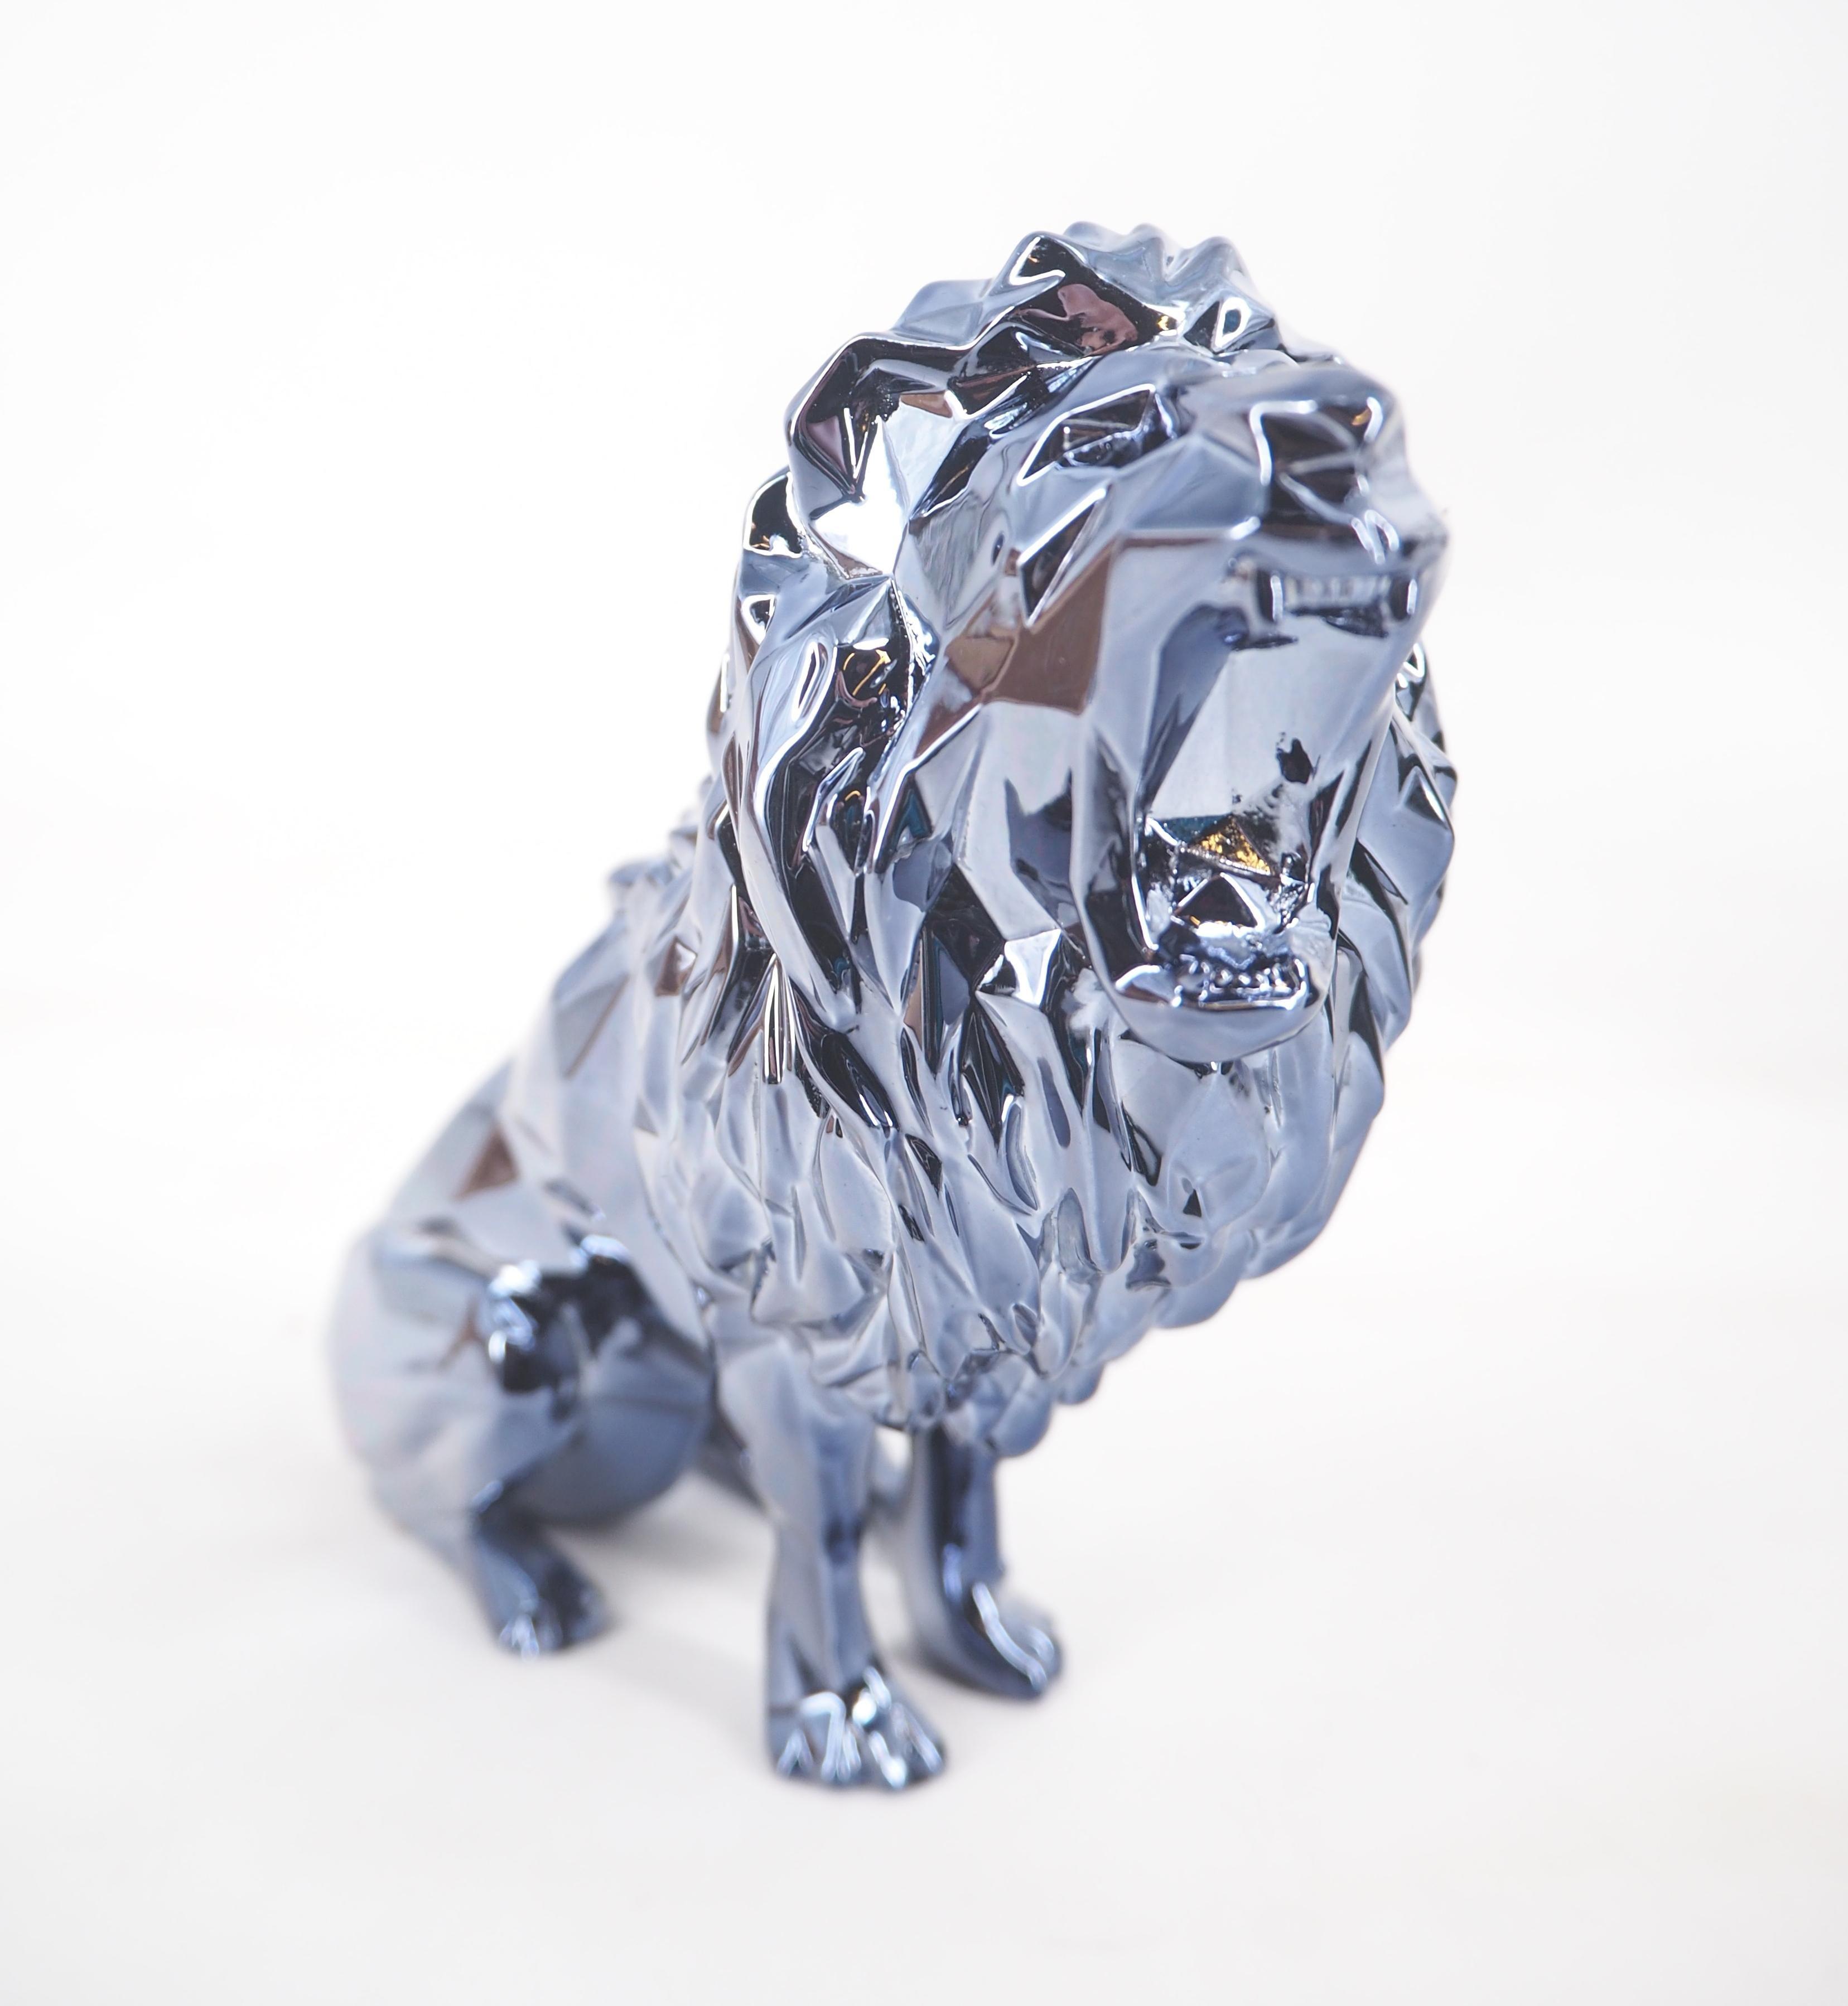 Roaring Lion Spirit (Petrol edition) - Sculpture